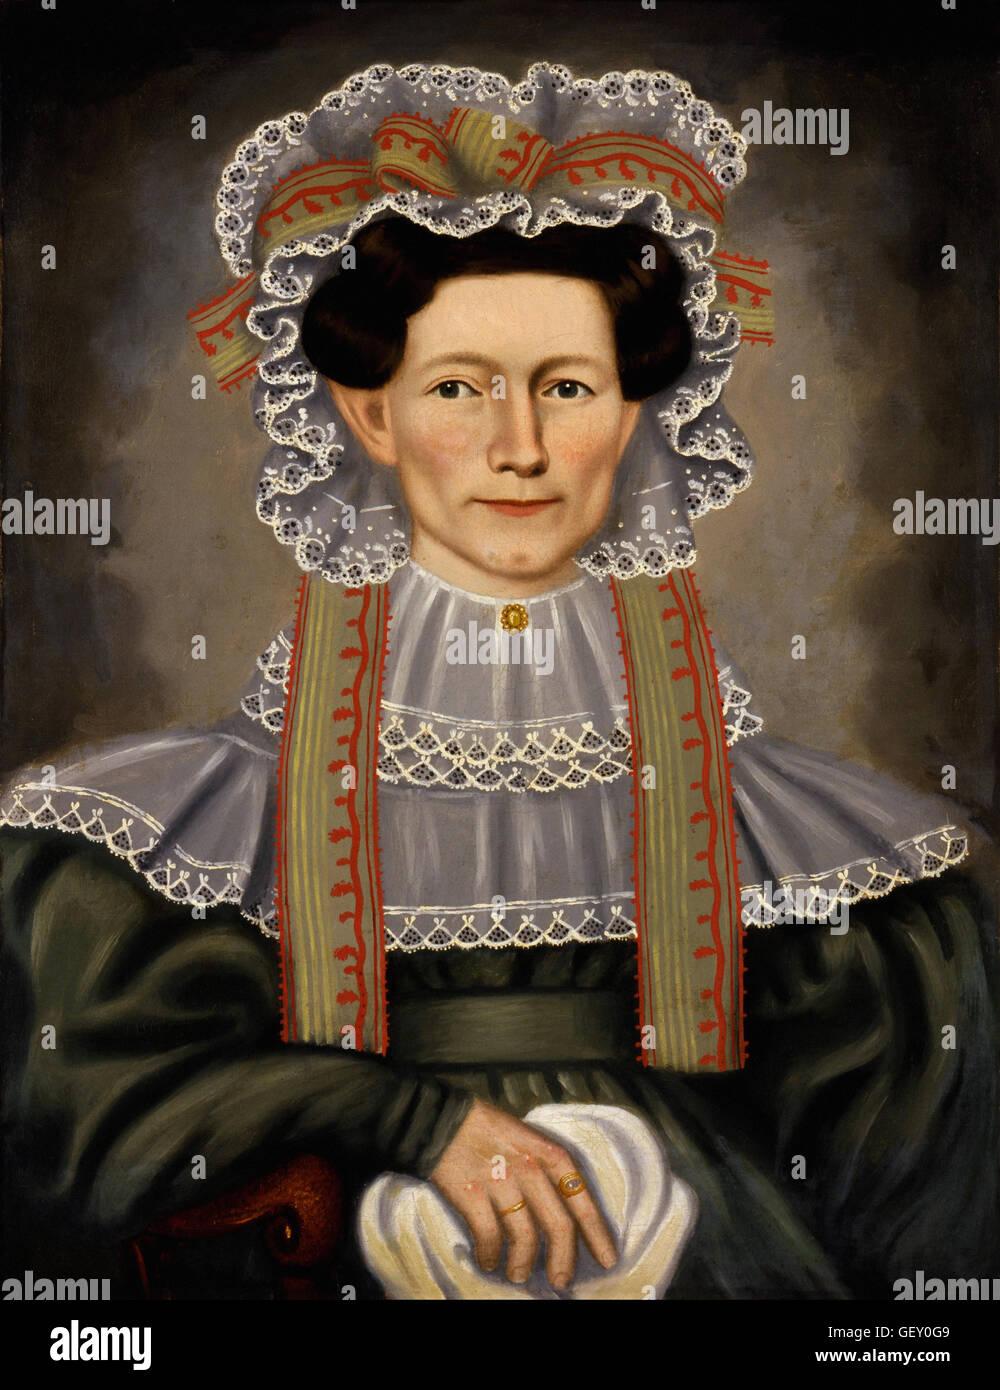 Erastus Salisbury Field - Lady of Squire Williams House - Stock Image